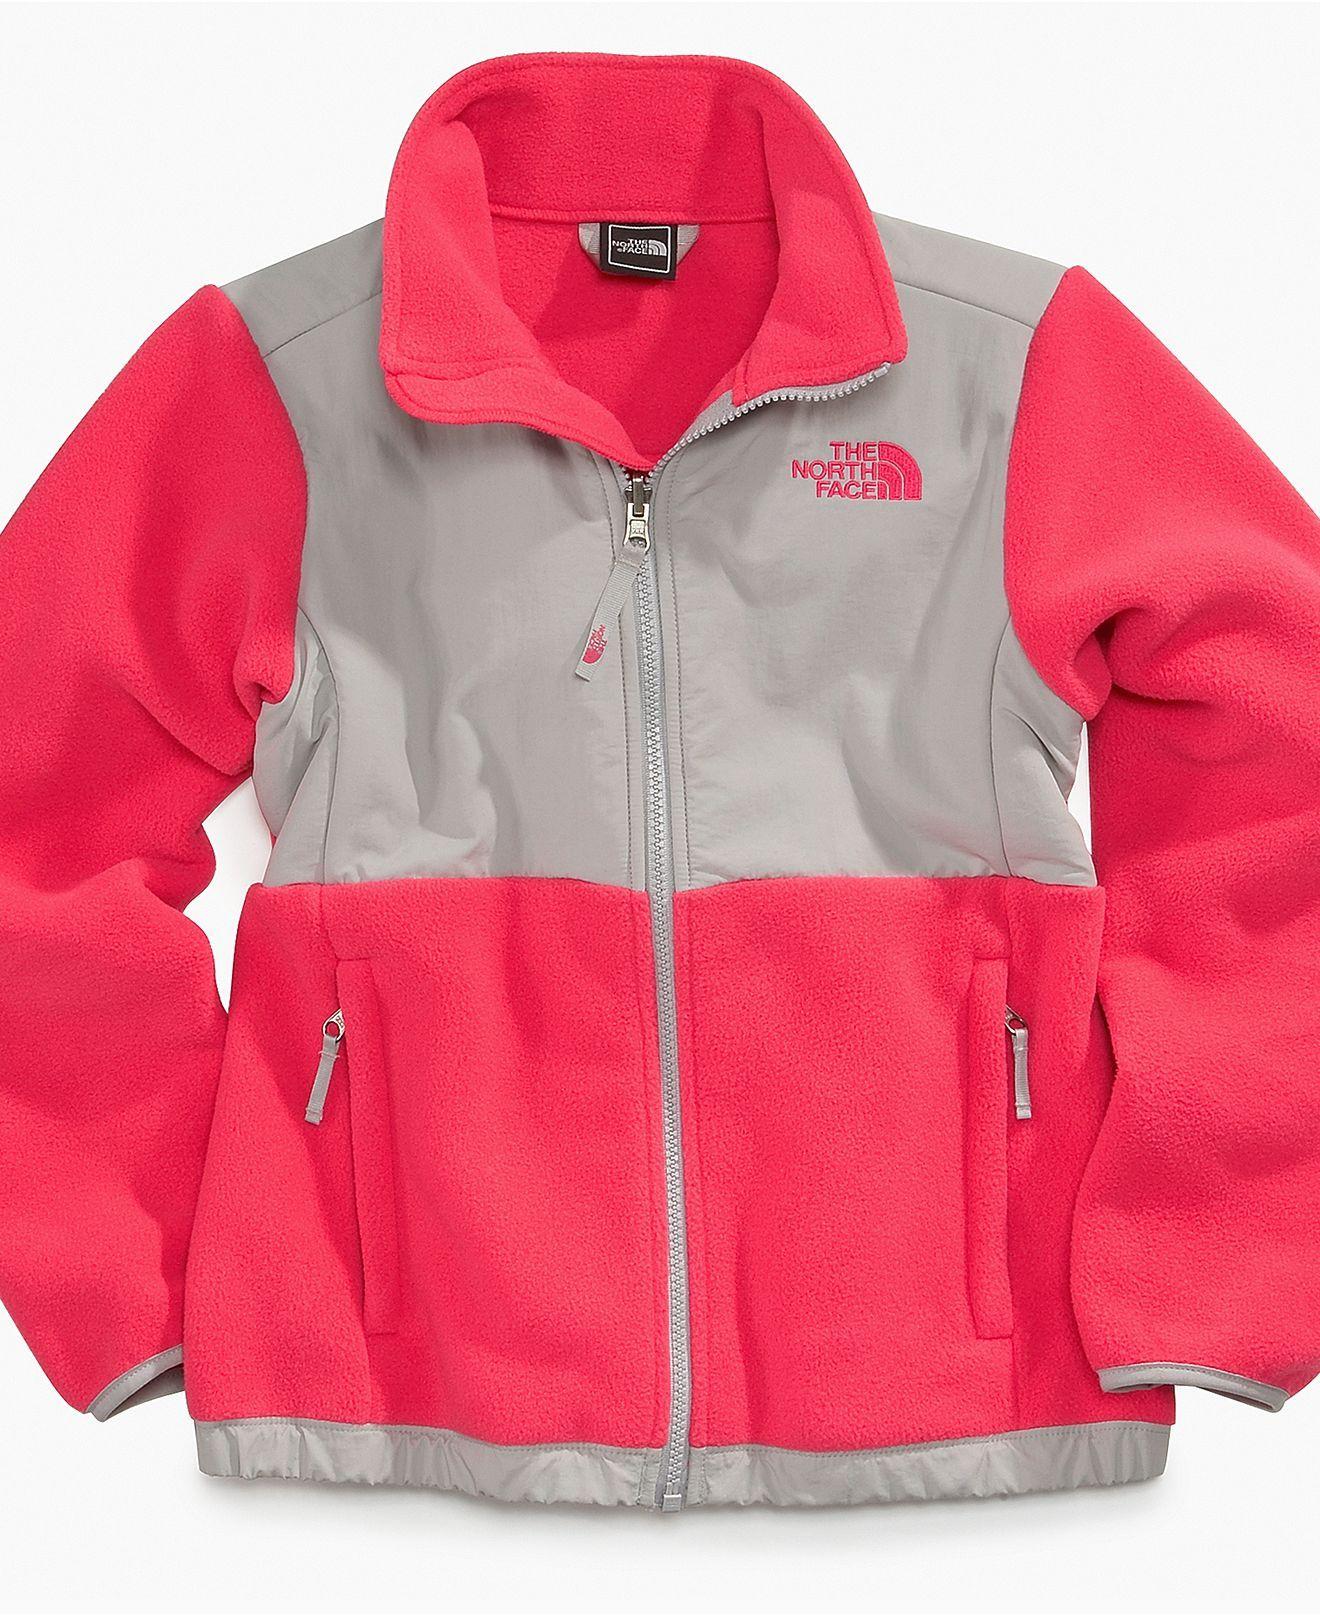 Love This Color Combo The North Face Kids Jacket Girls Denali Fleece Jacket Kids Girls 2 6x Macy S 109 00 North Face Kids Kids Jacket Girls Jackets Kids [ 1616 x 1320 Pixel ]